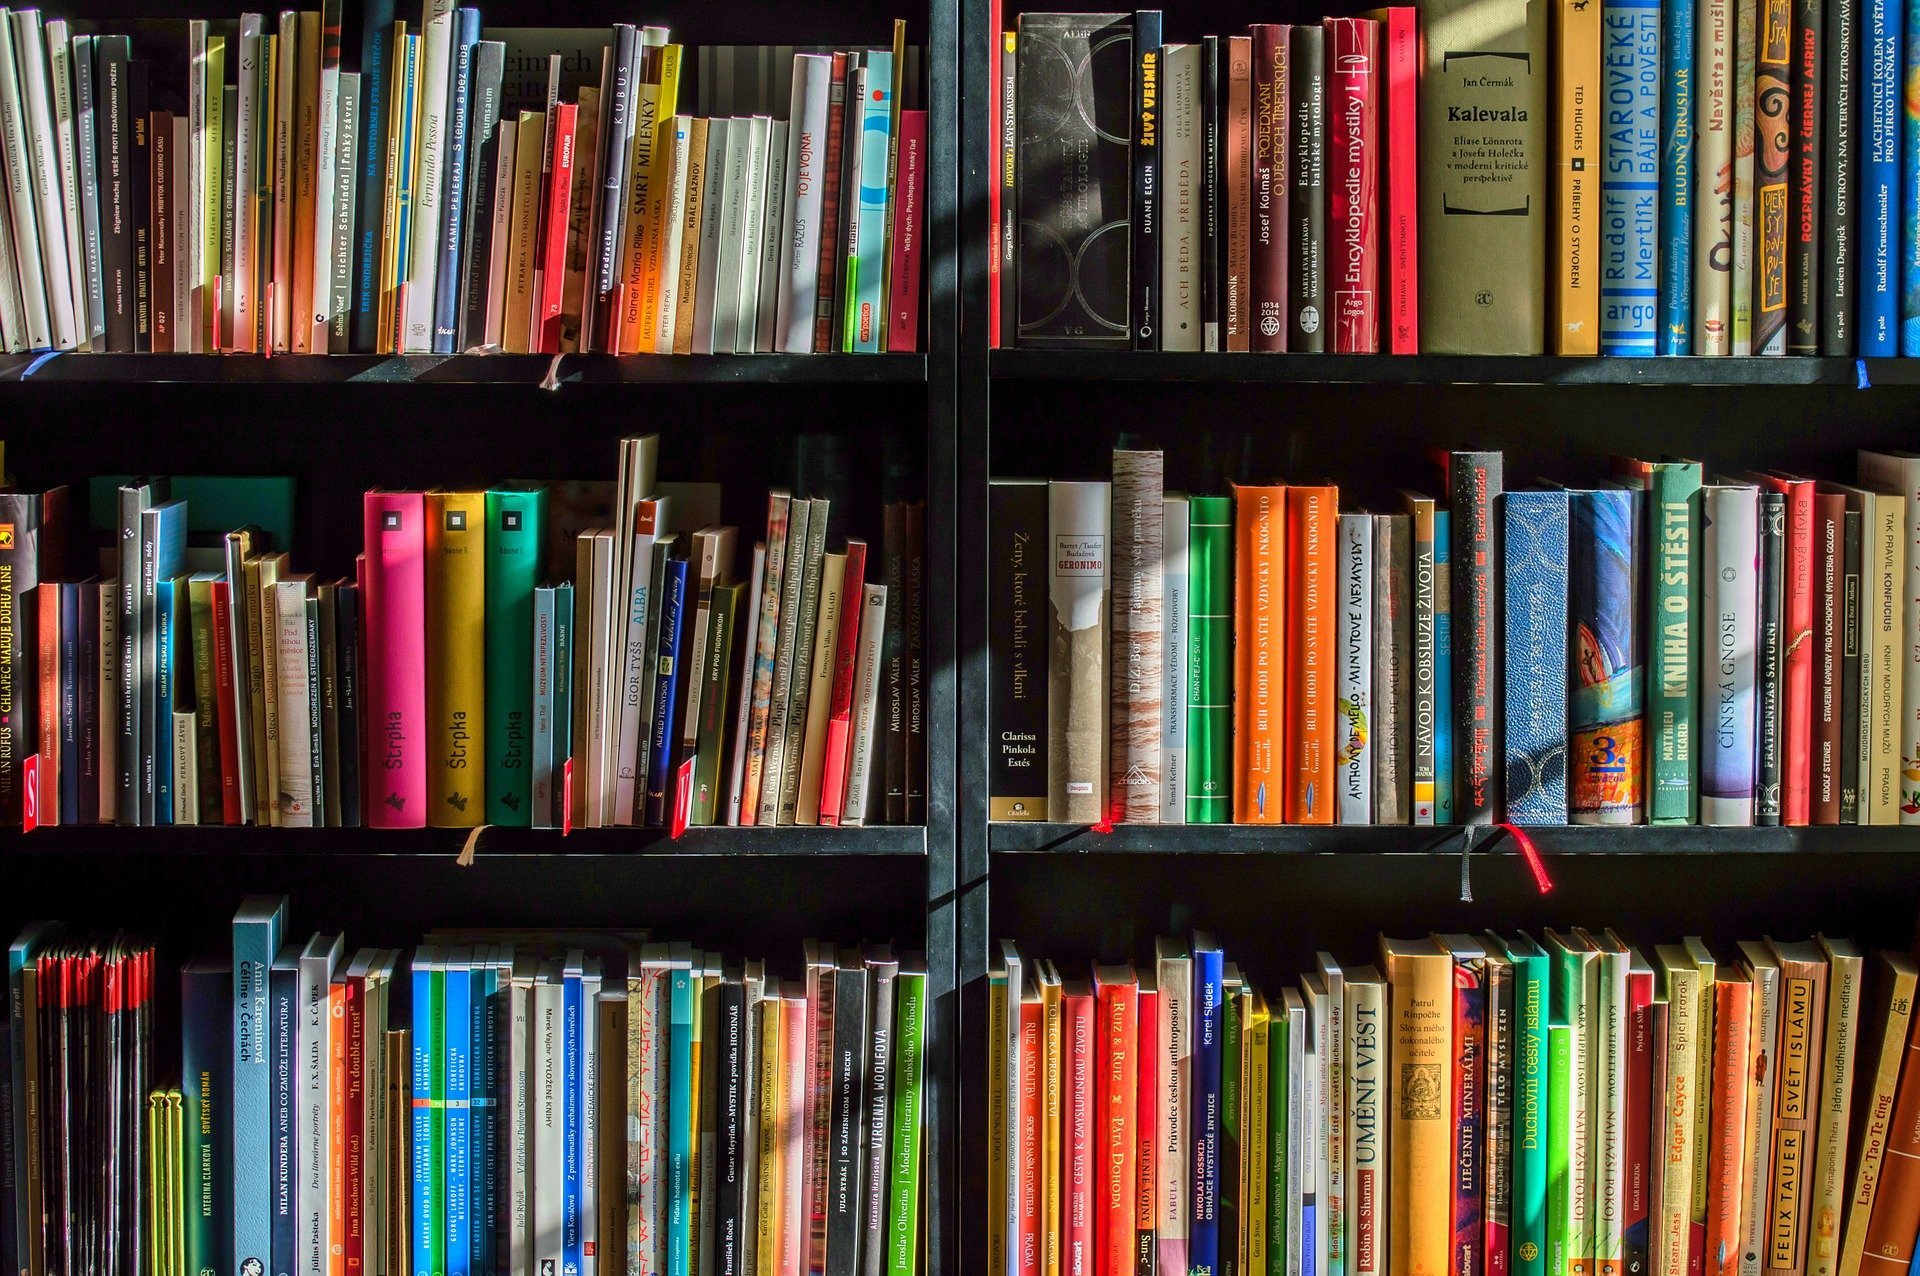 Free loan of books in Albox